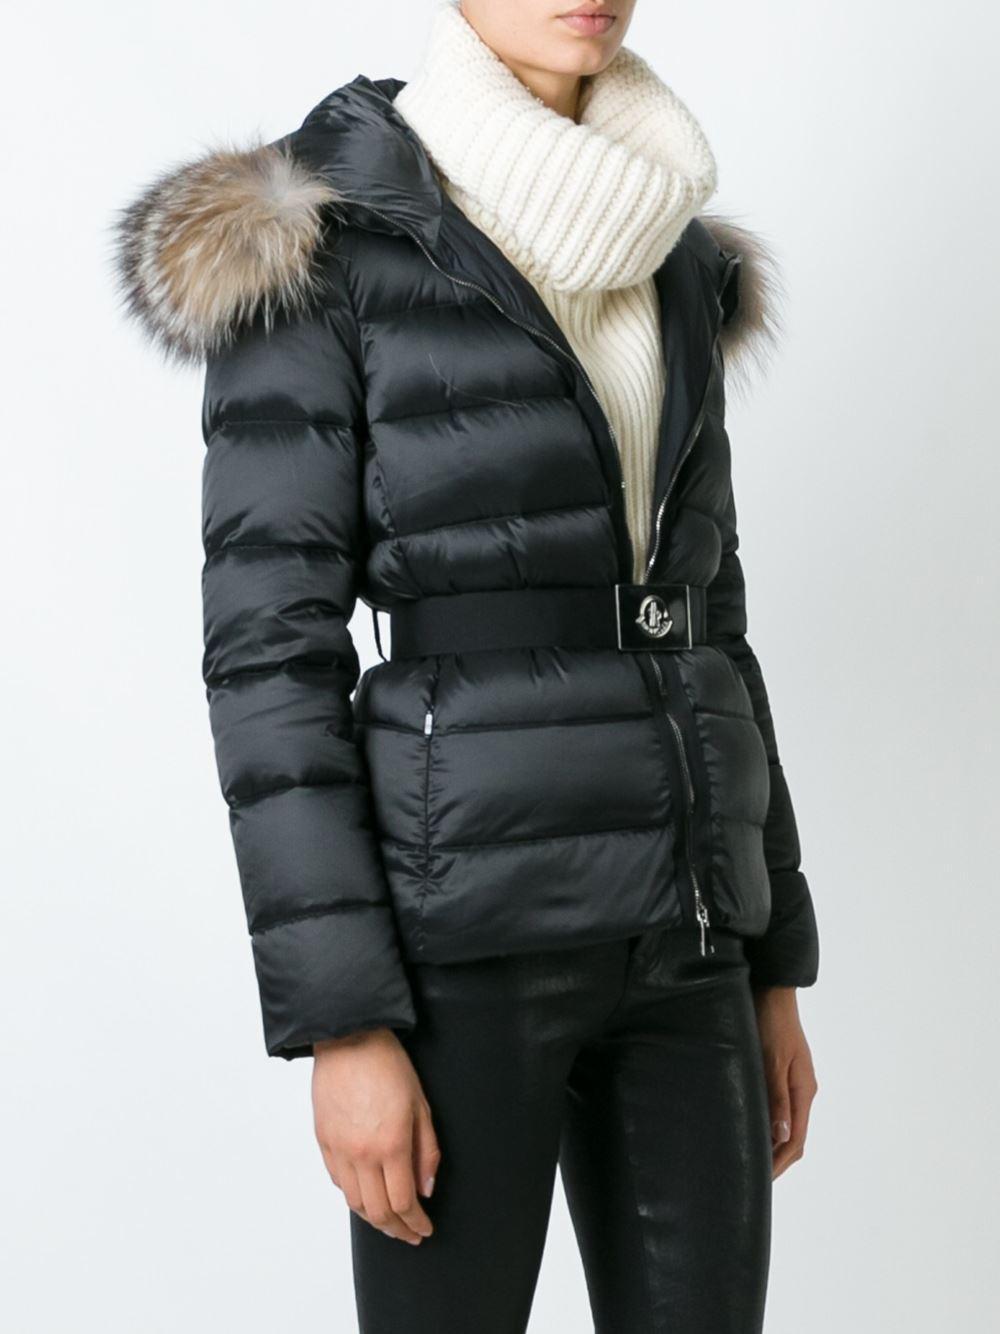 Lyst - Moncler 'tatie' Padded Jacket in Black